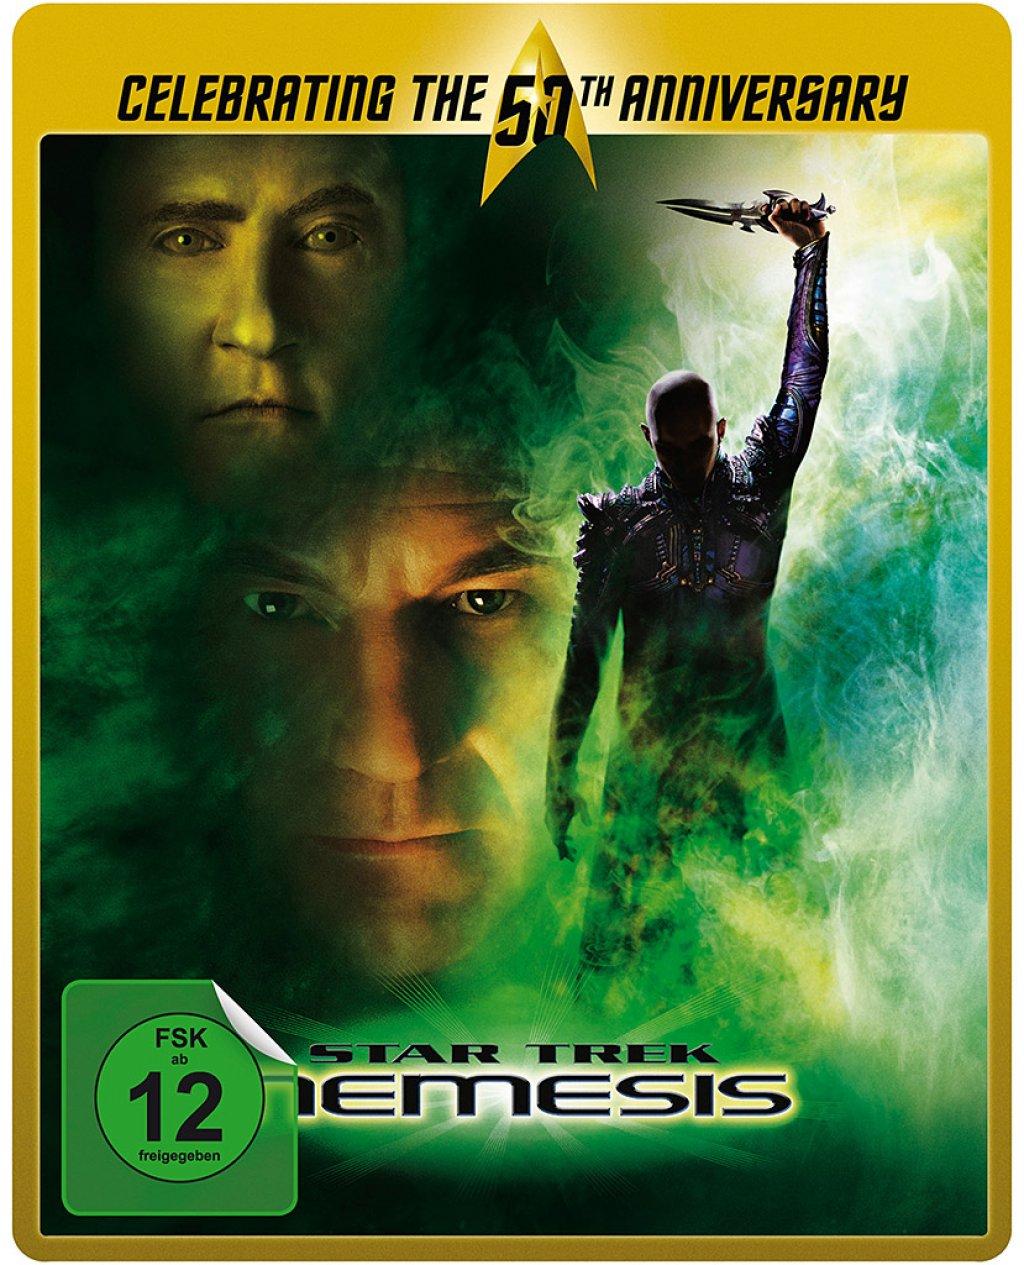 Star Trek X - Nemesis - Steelbook (Blu-ray)